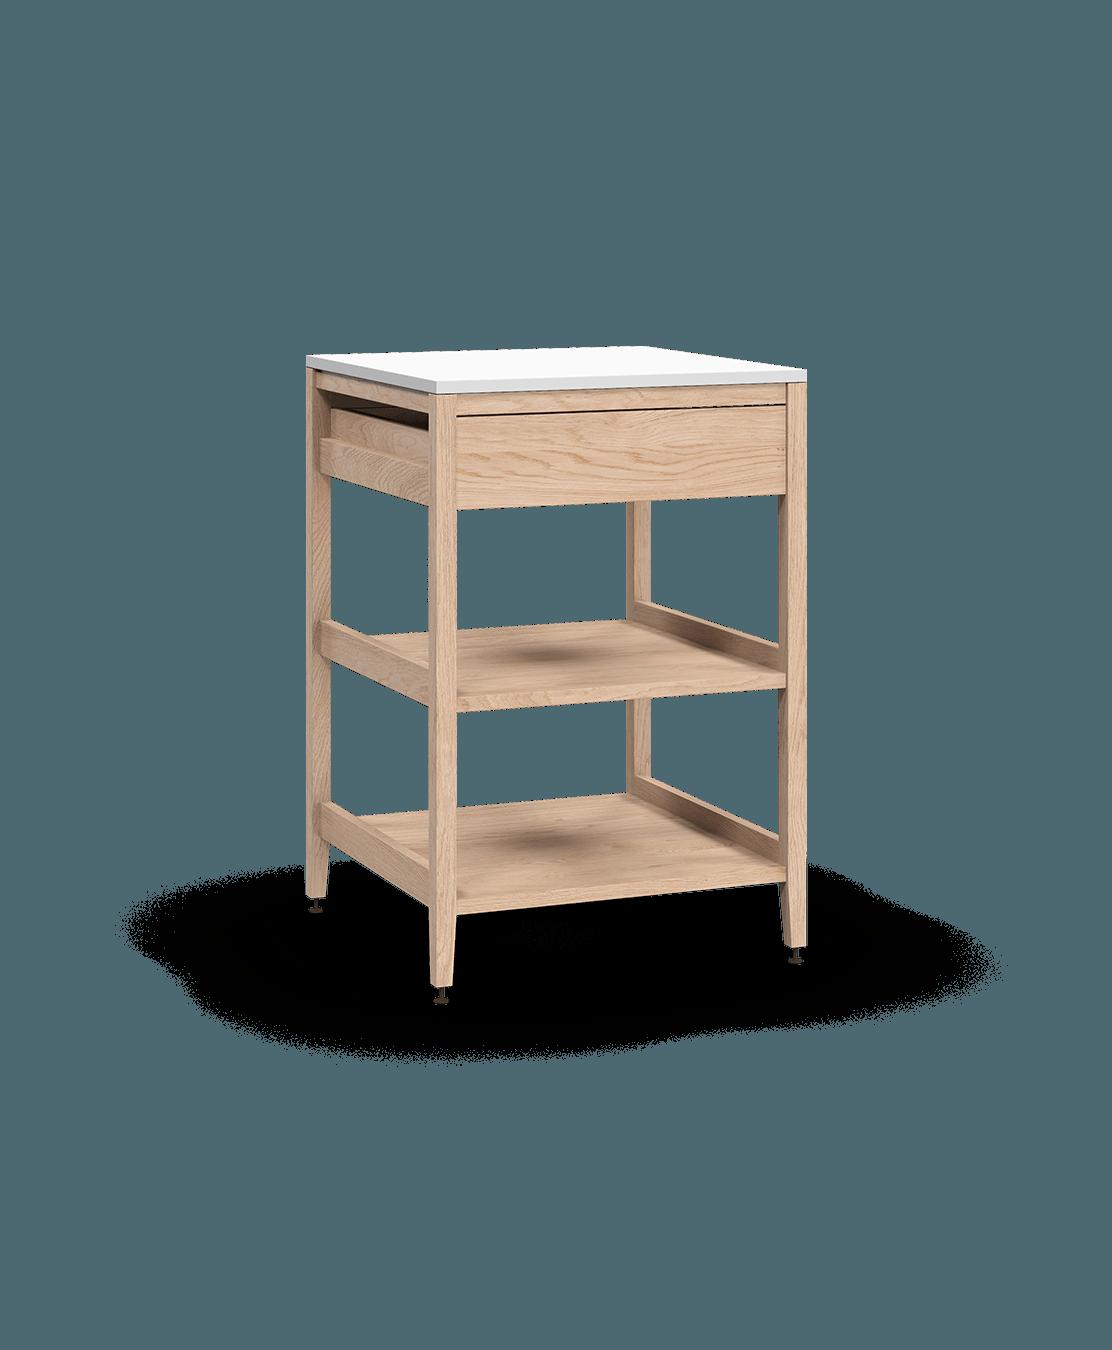 coquo radix white oak solid wood modular 2 wood shelves 1 drawer base kitchen cabinet 24 inch C1-C-24SBW-102W1-NA